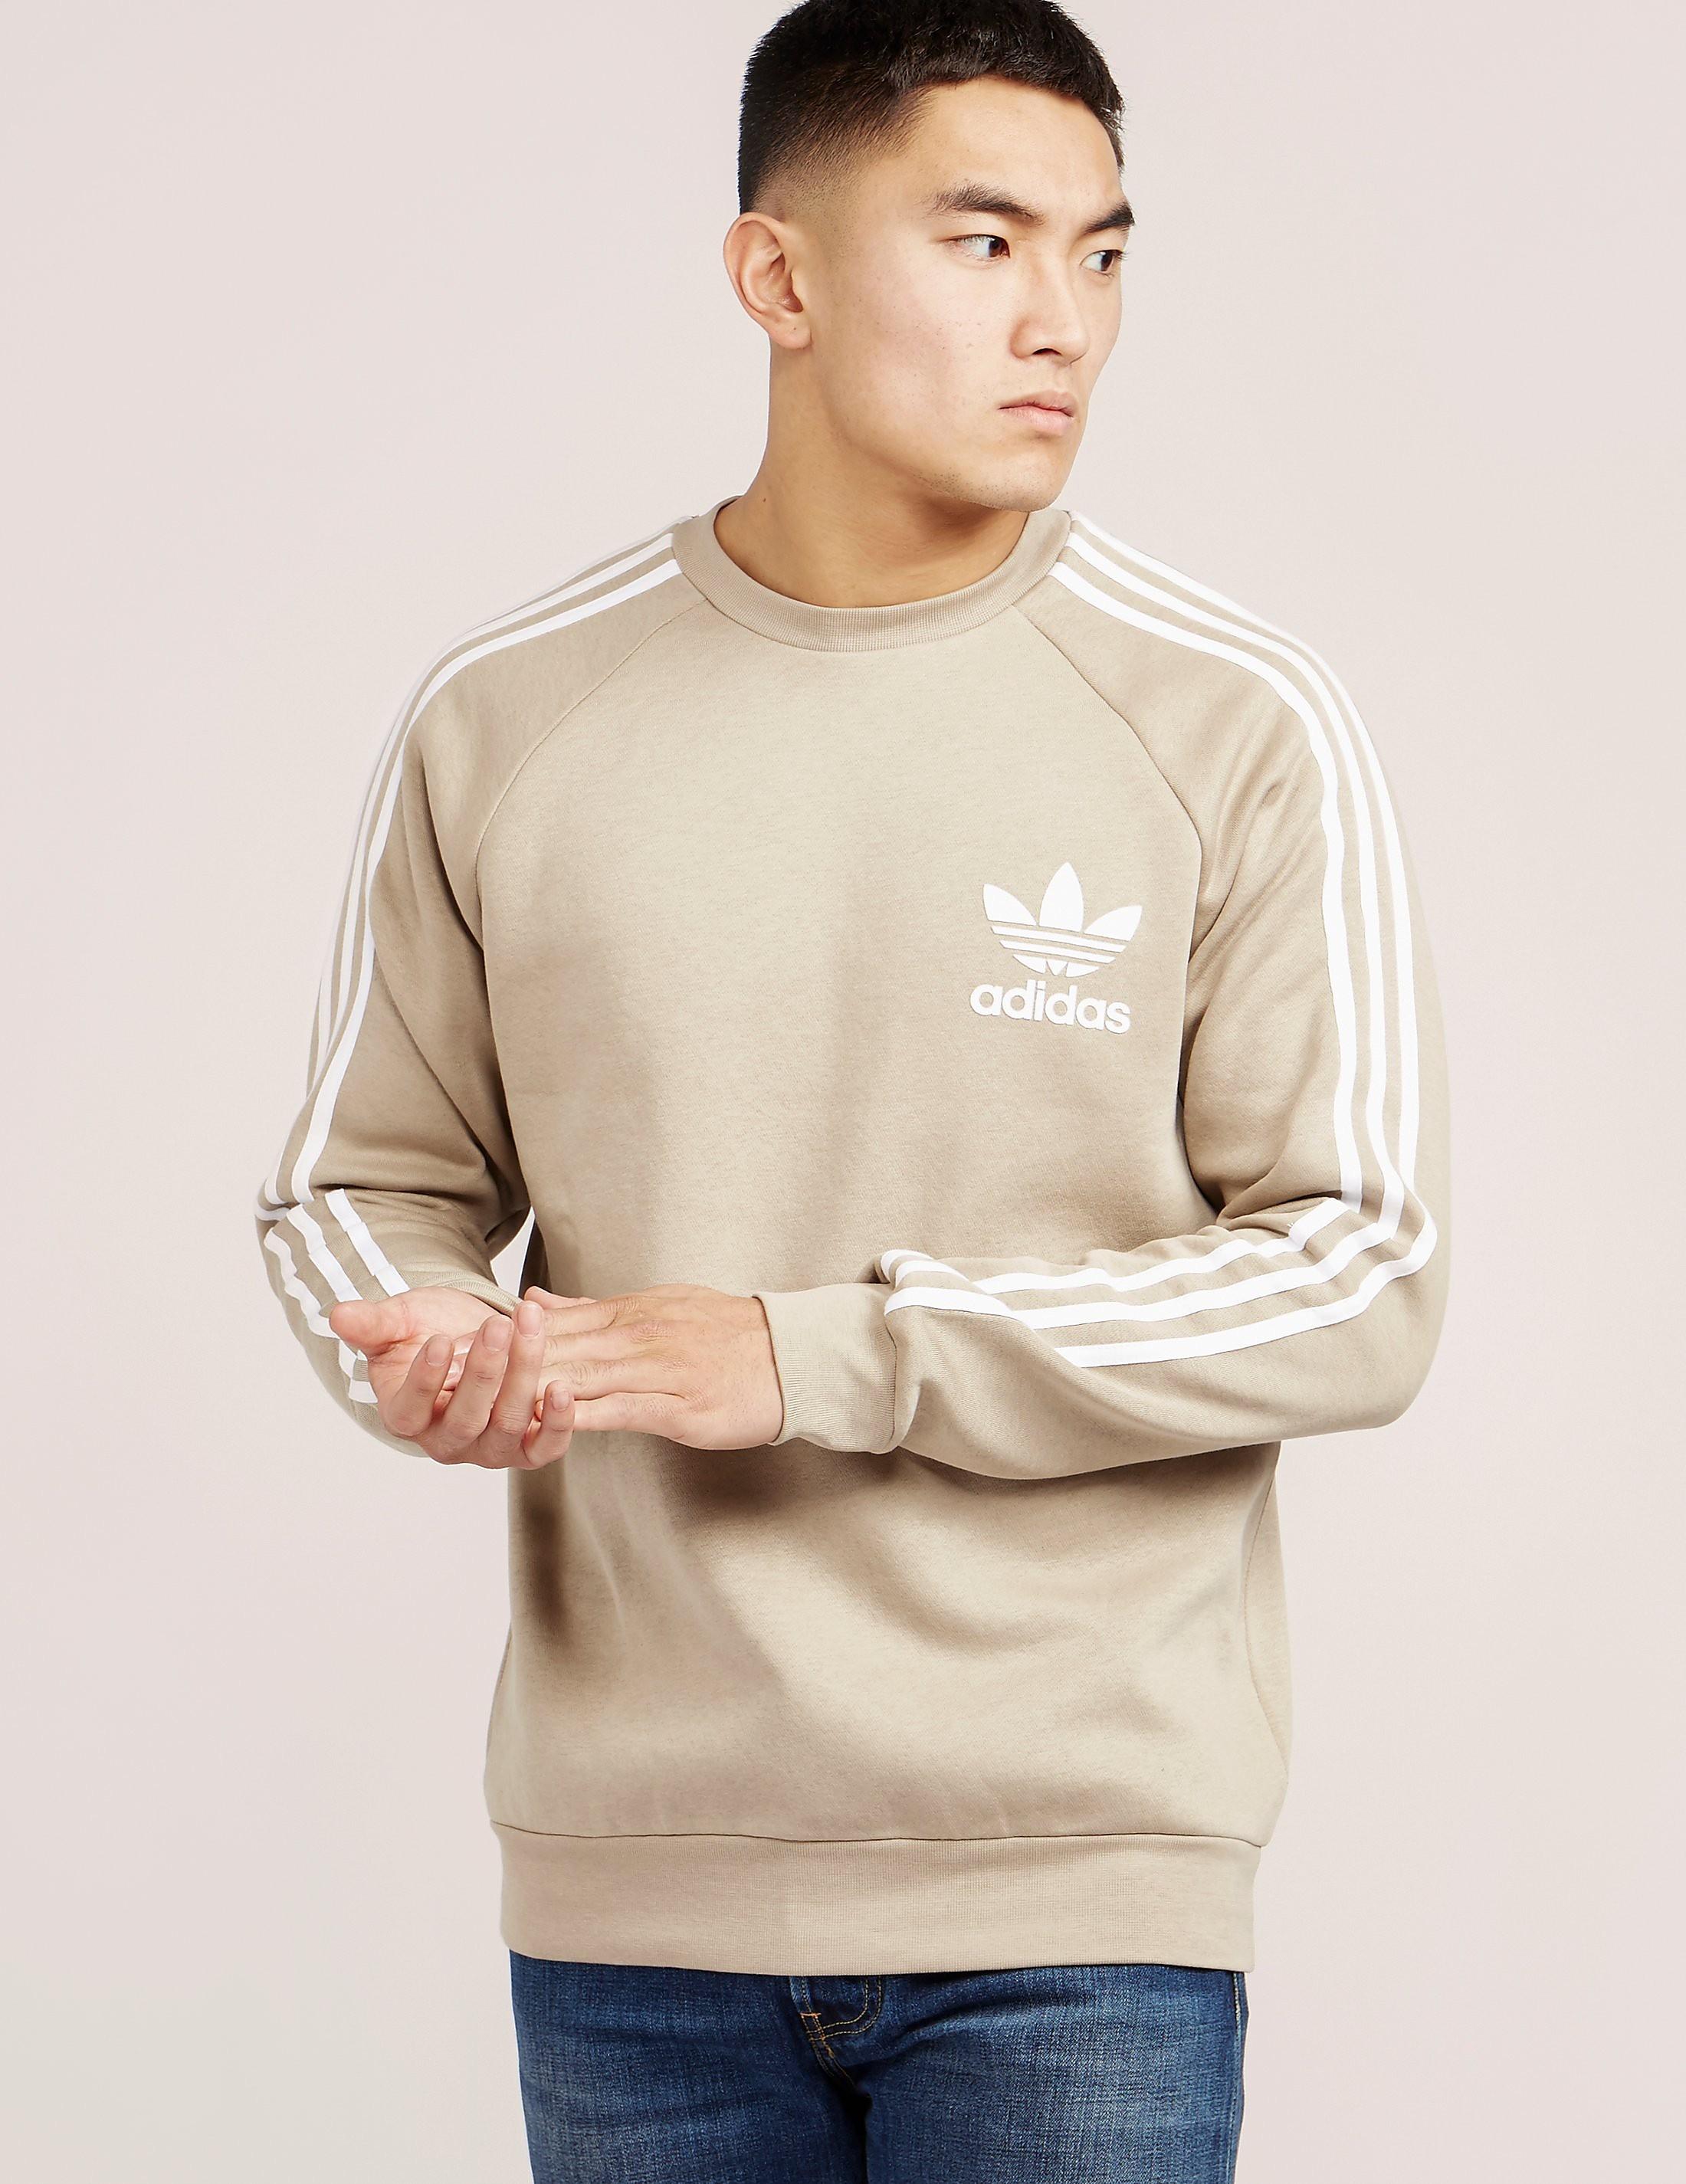 adidas Originals California Crew Neck Sweatshirt